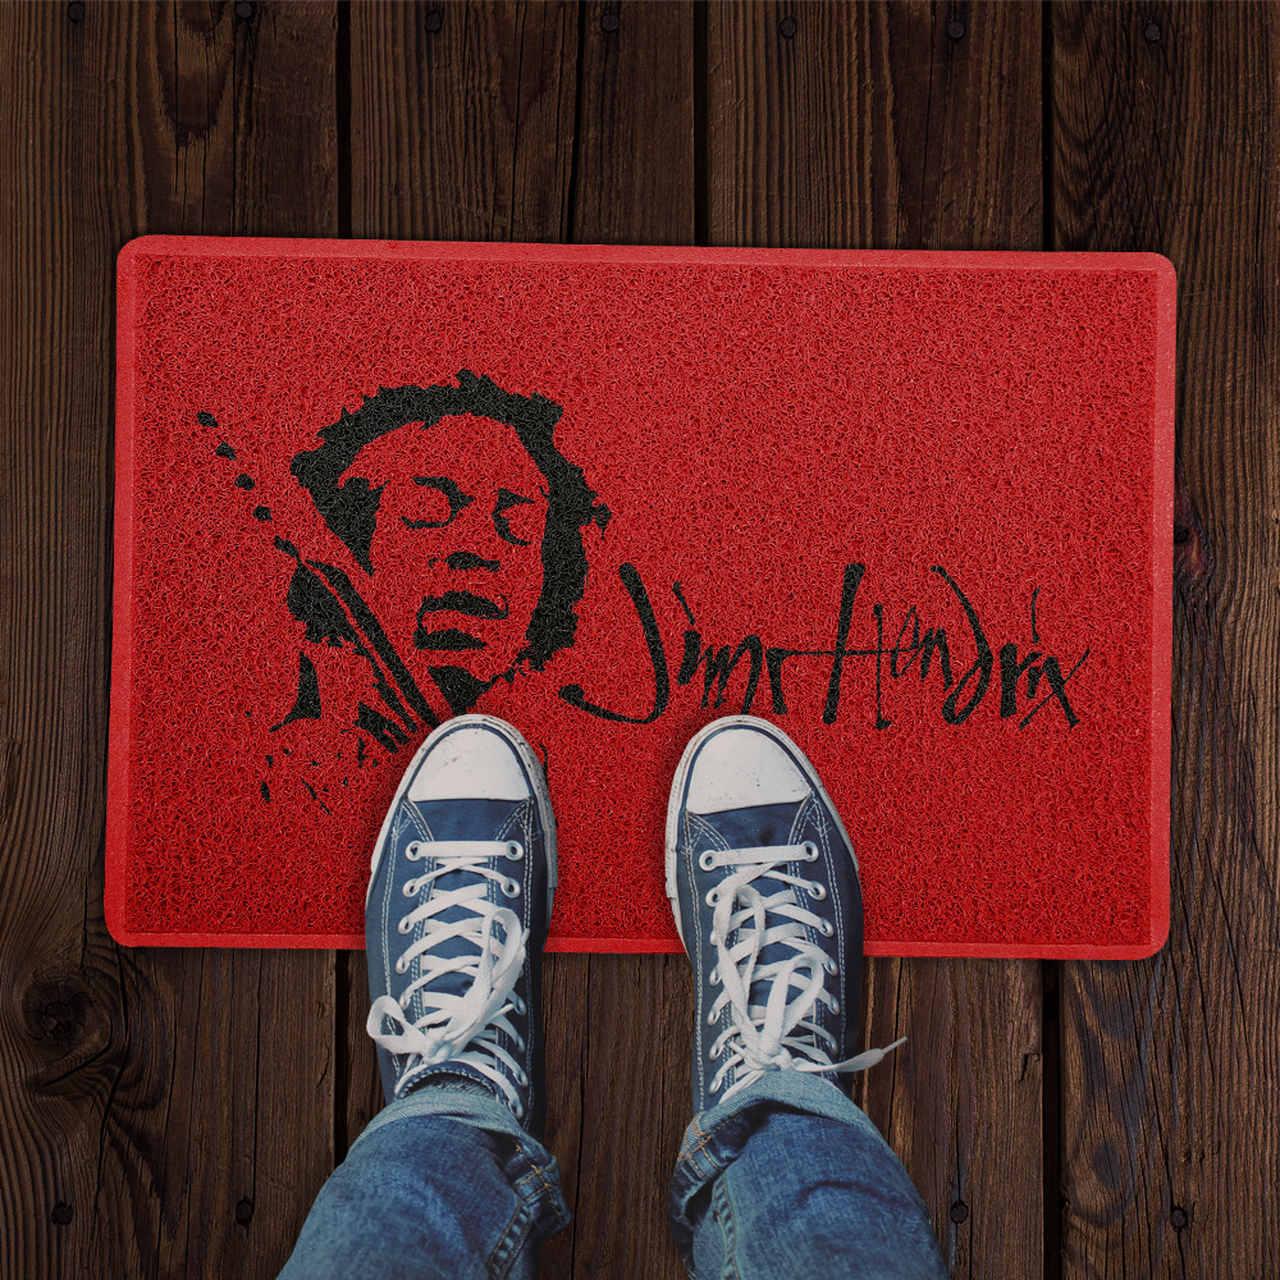 Capacho Jimi Hendrix